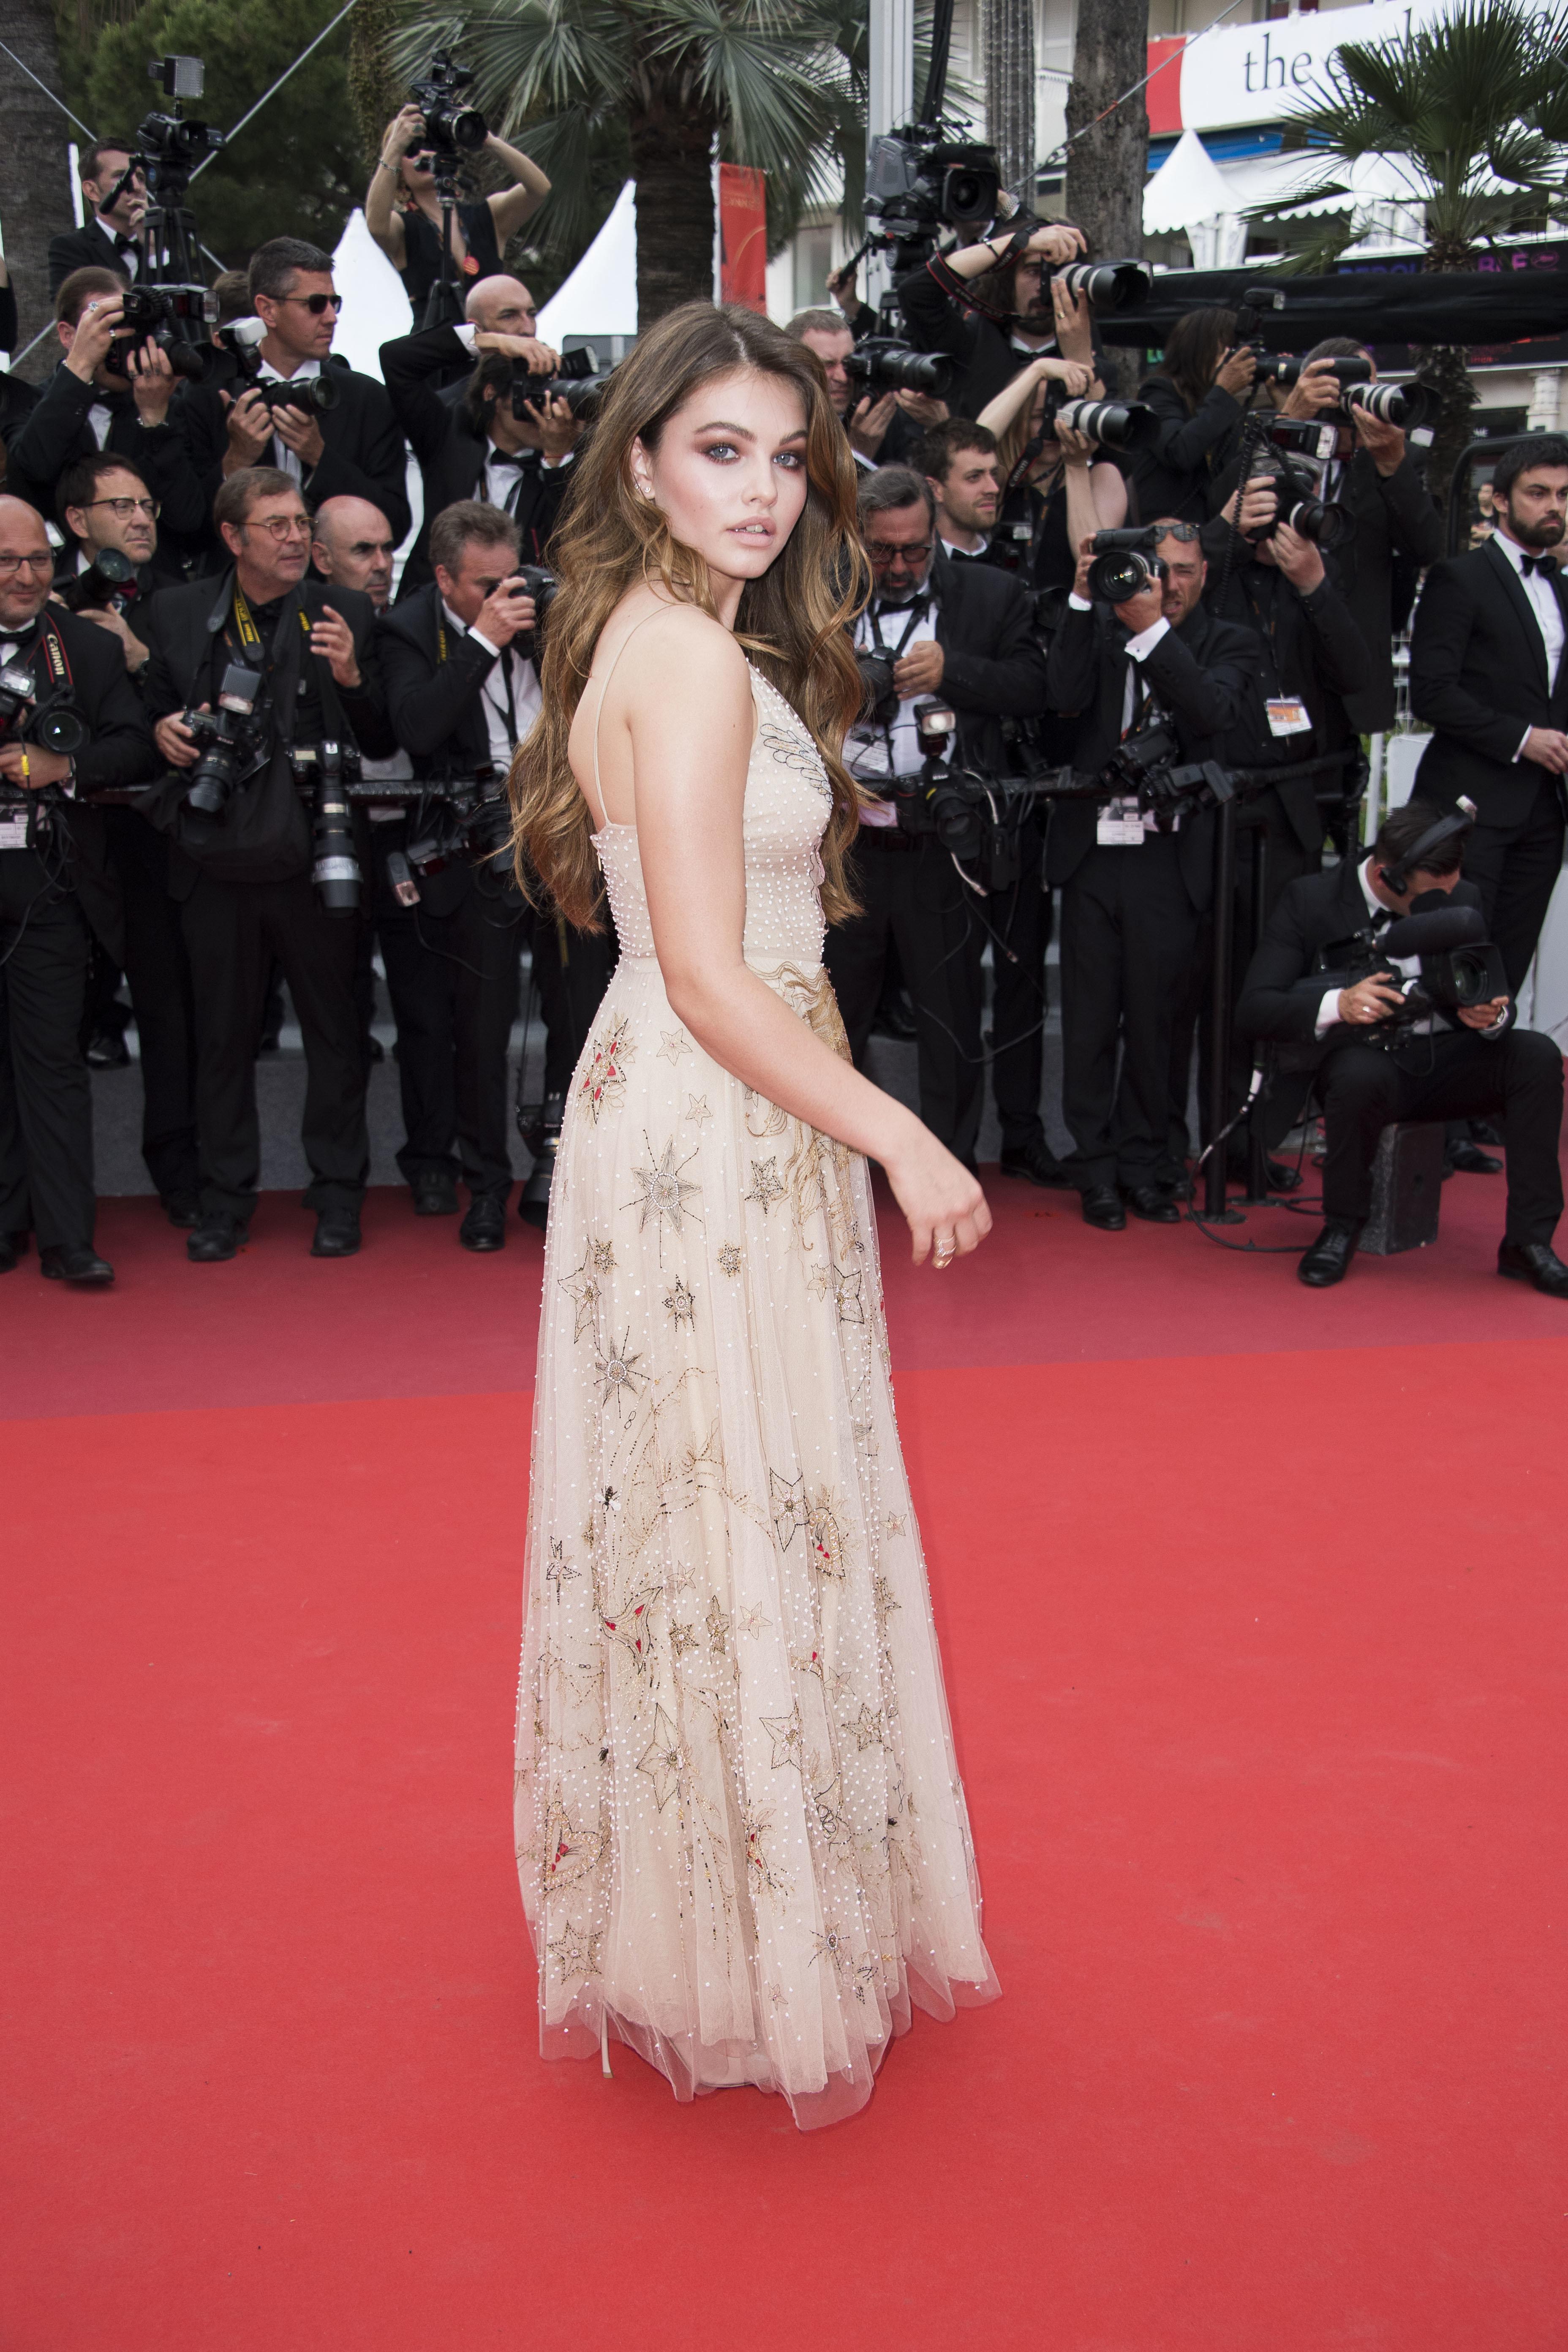 La modelo francesa Thylane Blondeau